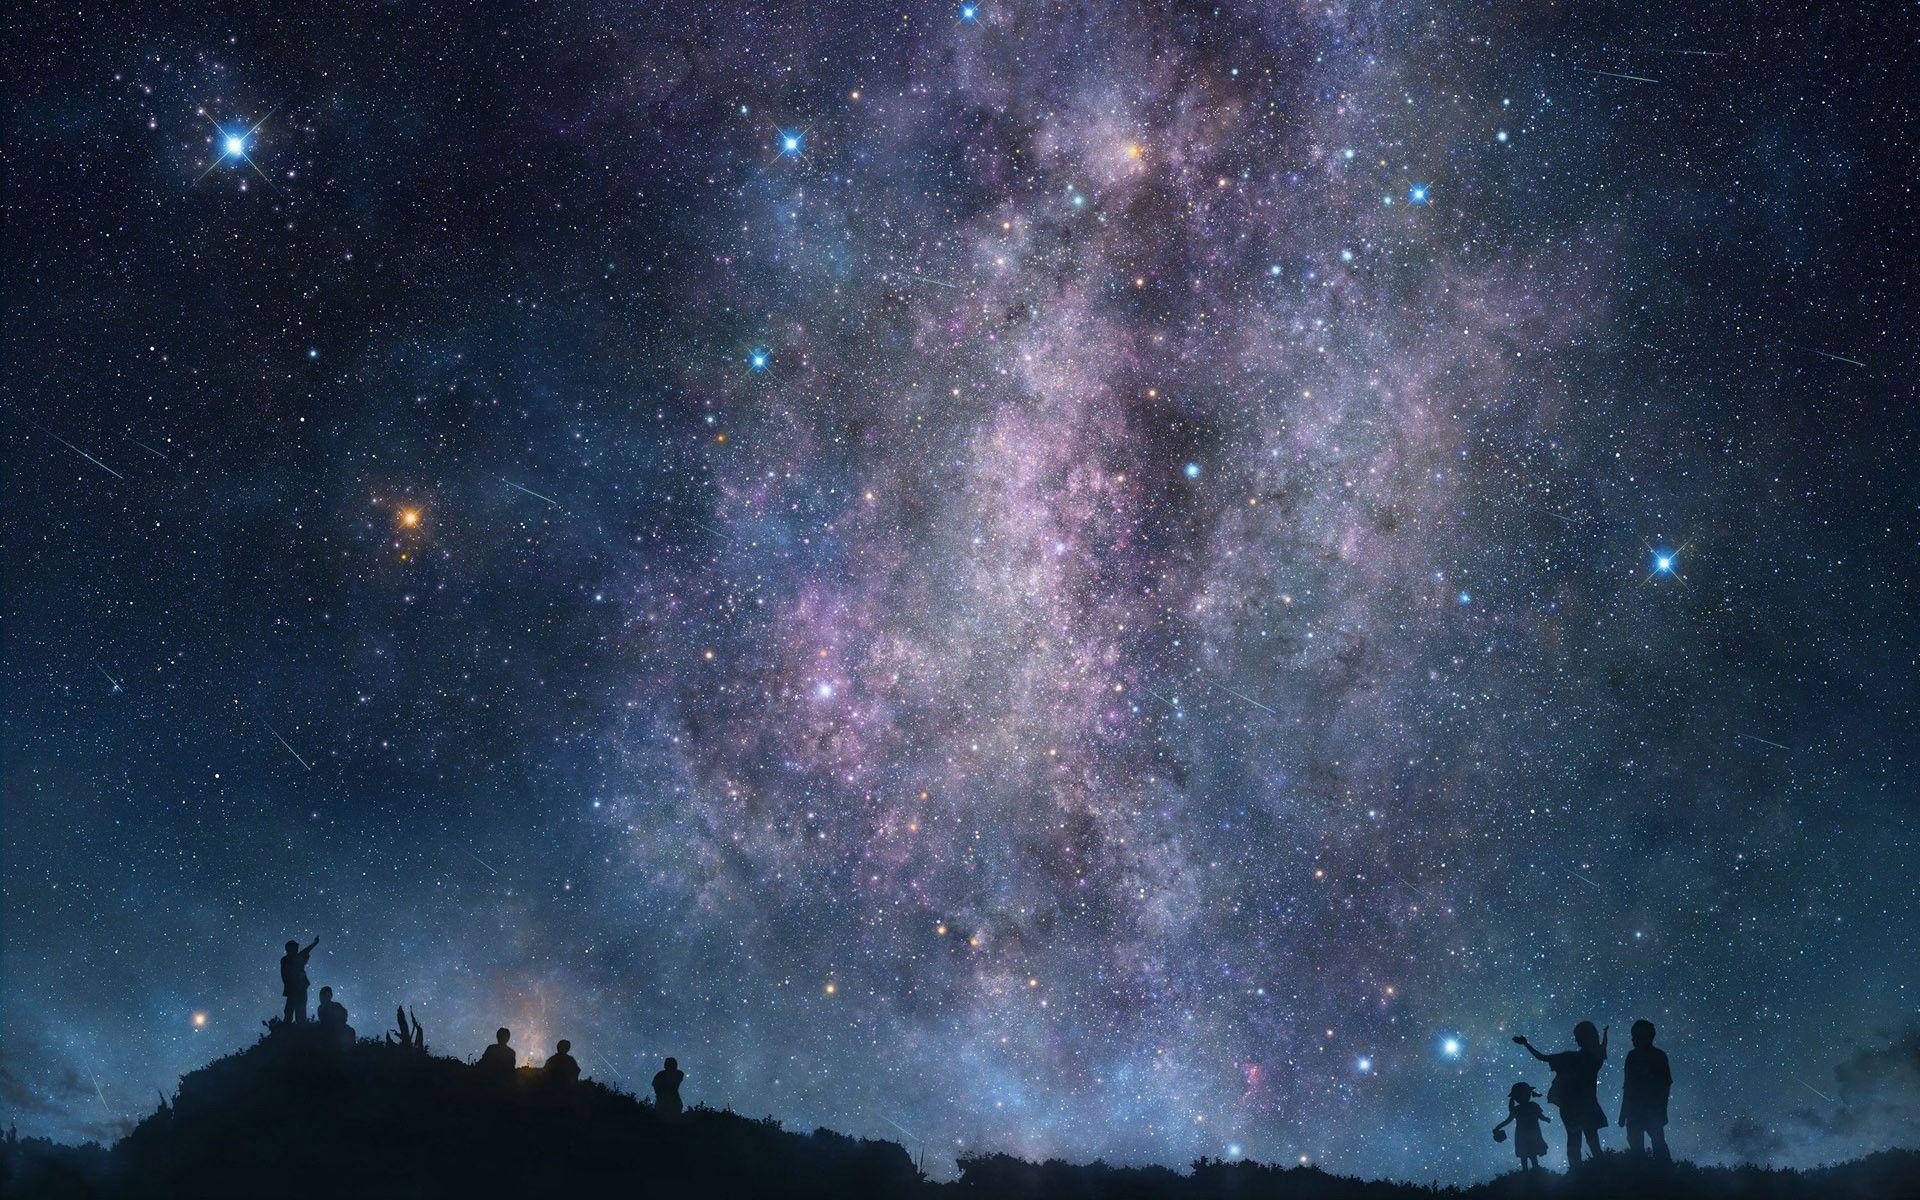 Hd wallpaper night - Night Sky Wallpapers Full Hd Wallpaper Search